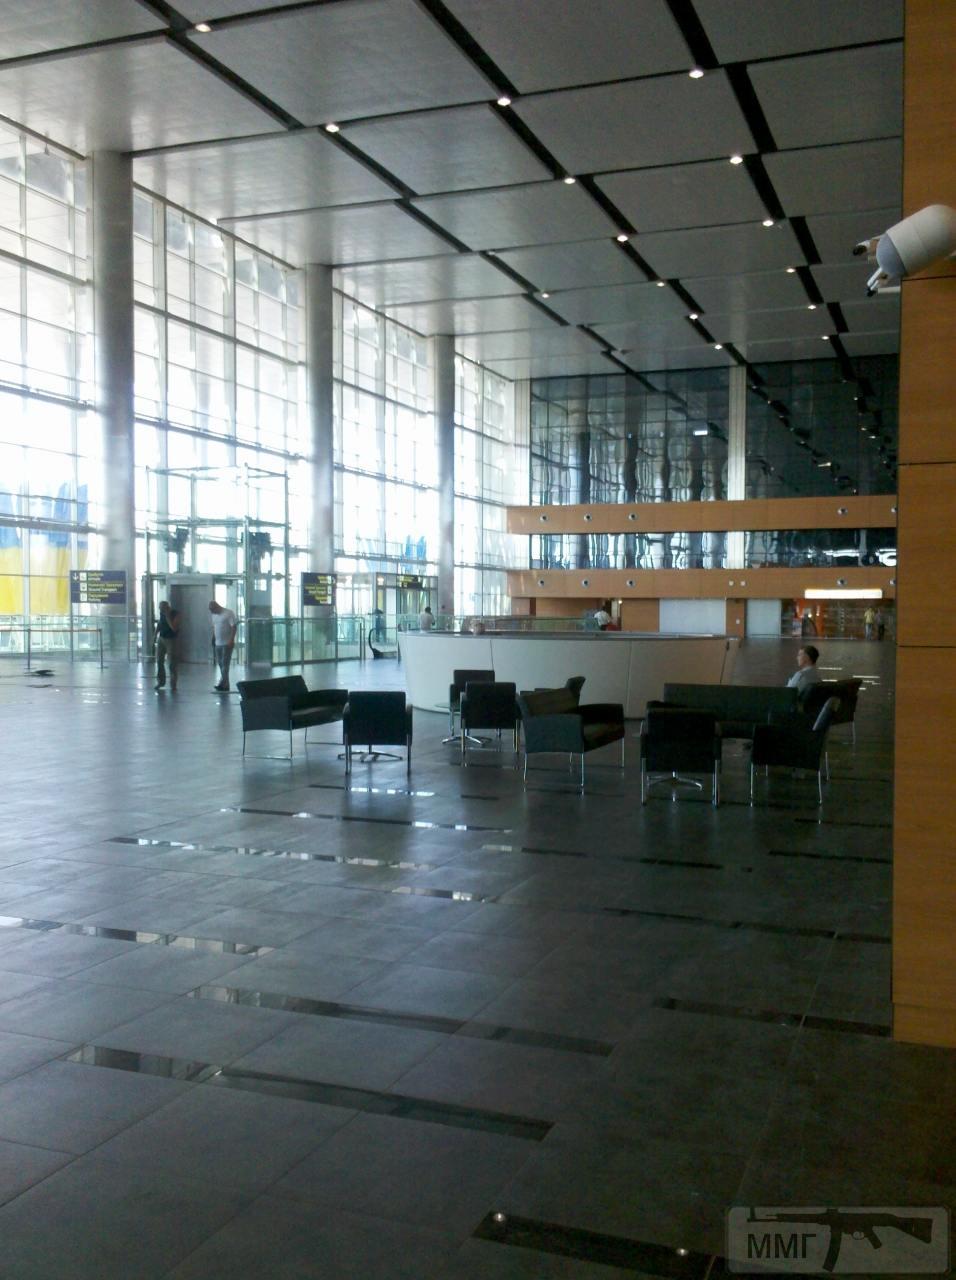 34318 - Донецкий аэропорт, новый терминал